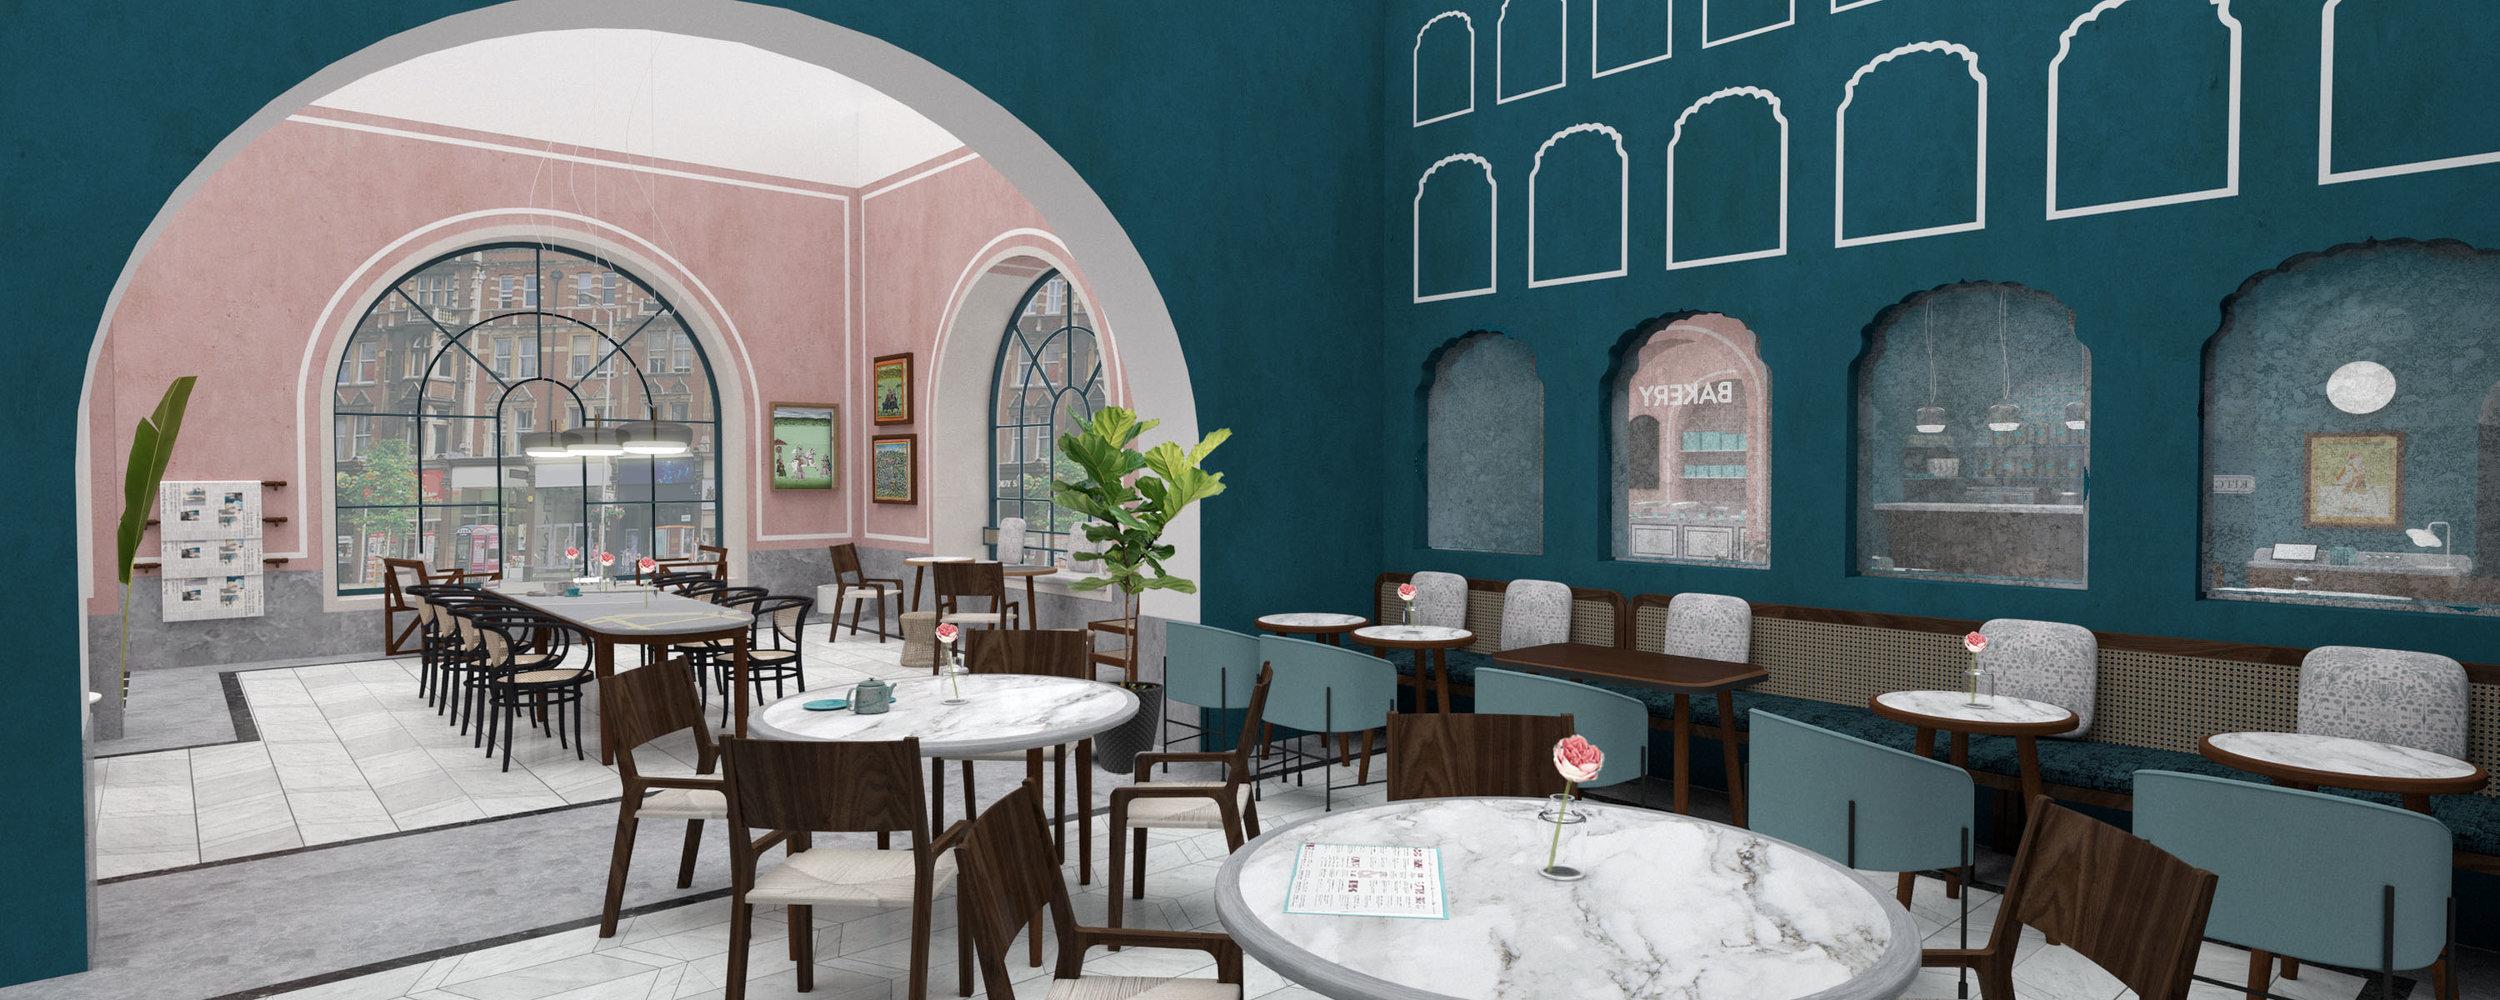 lunarlunar_interior_design_cafe_bakery_restaurant_pistachio_rose_seating_5.jpg